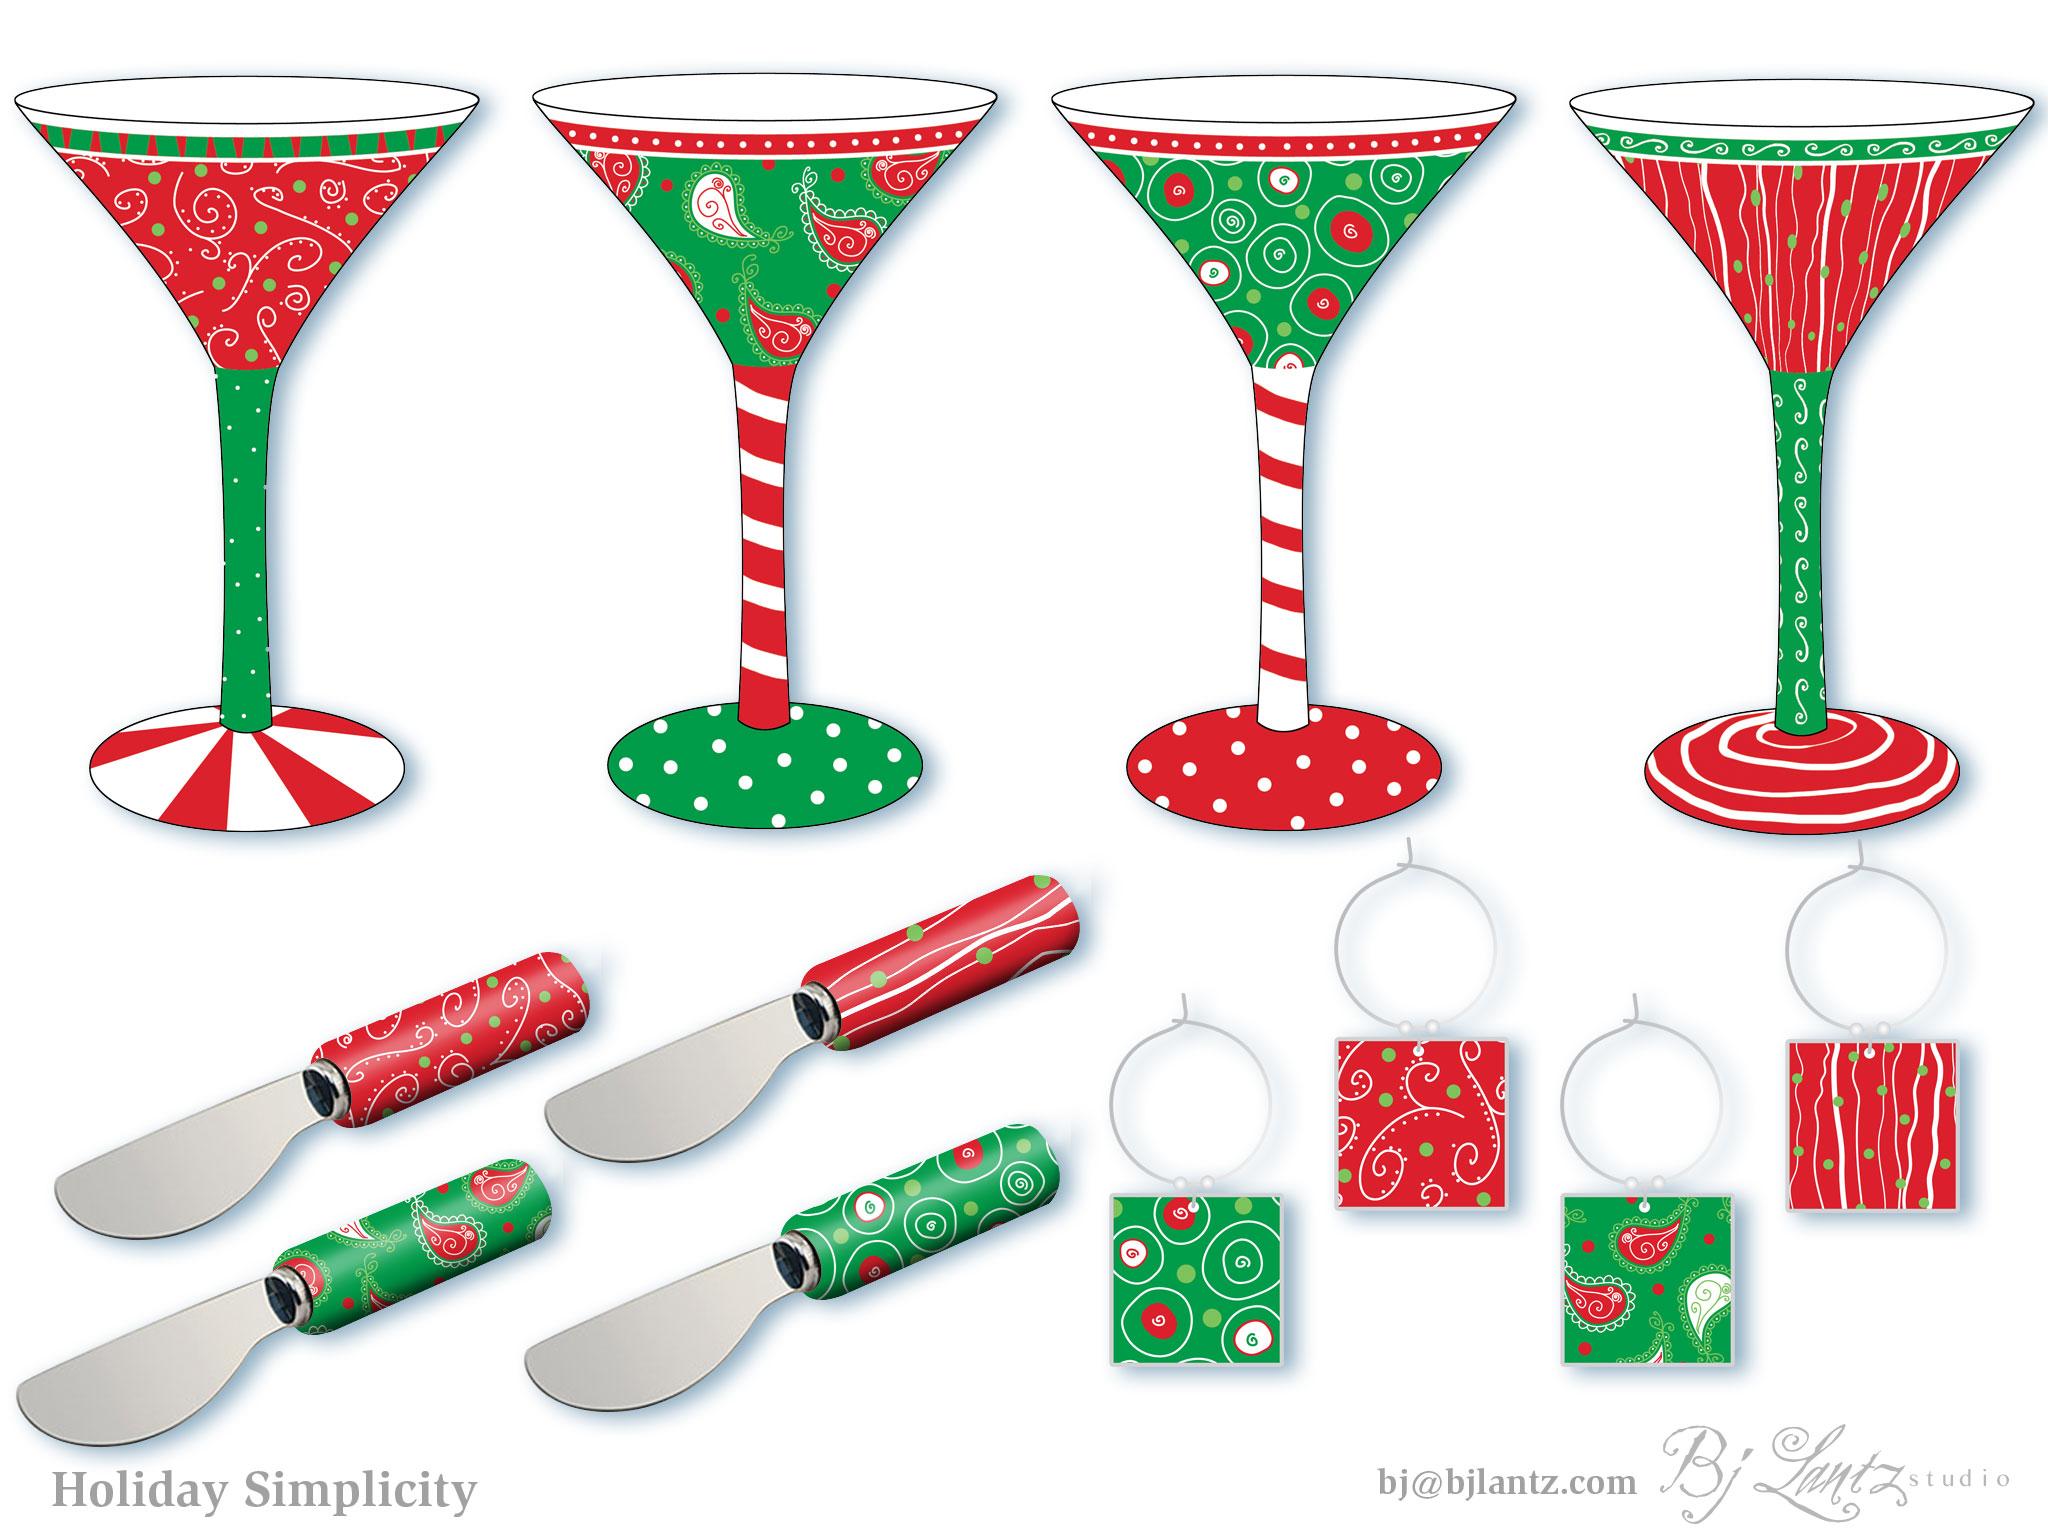 HolidaySimplicity_portfolio_2.jpg